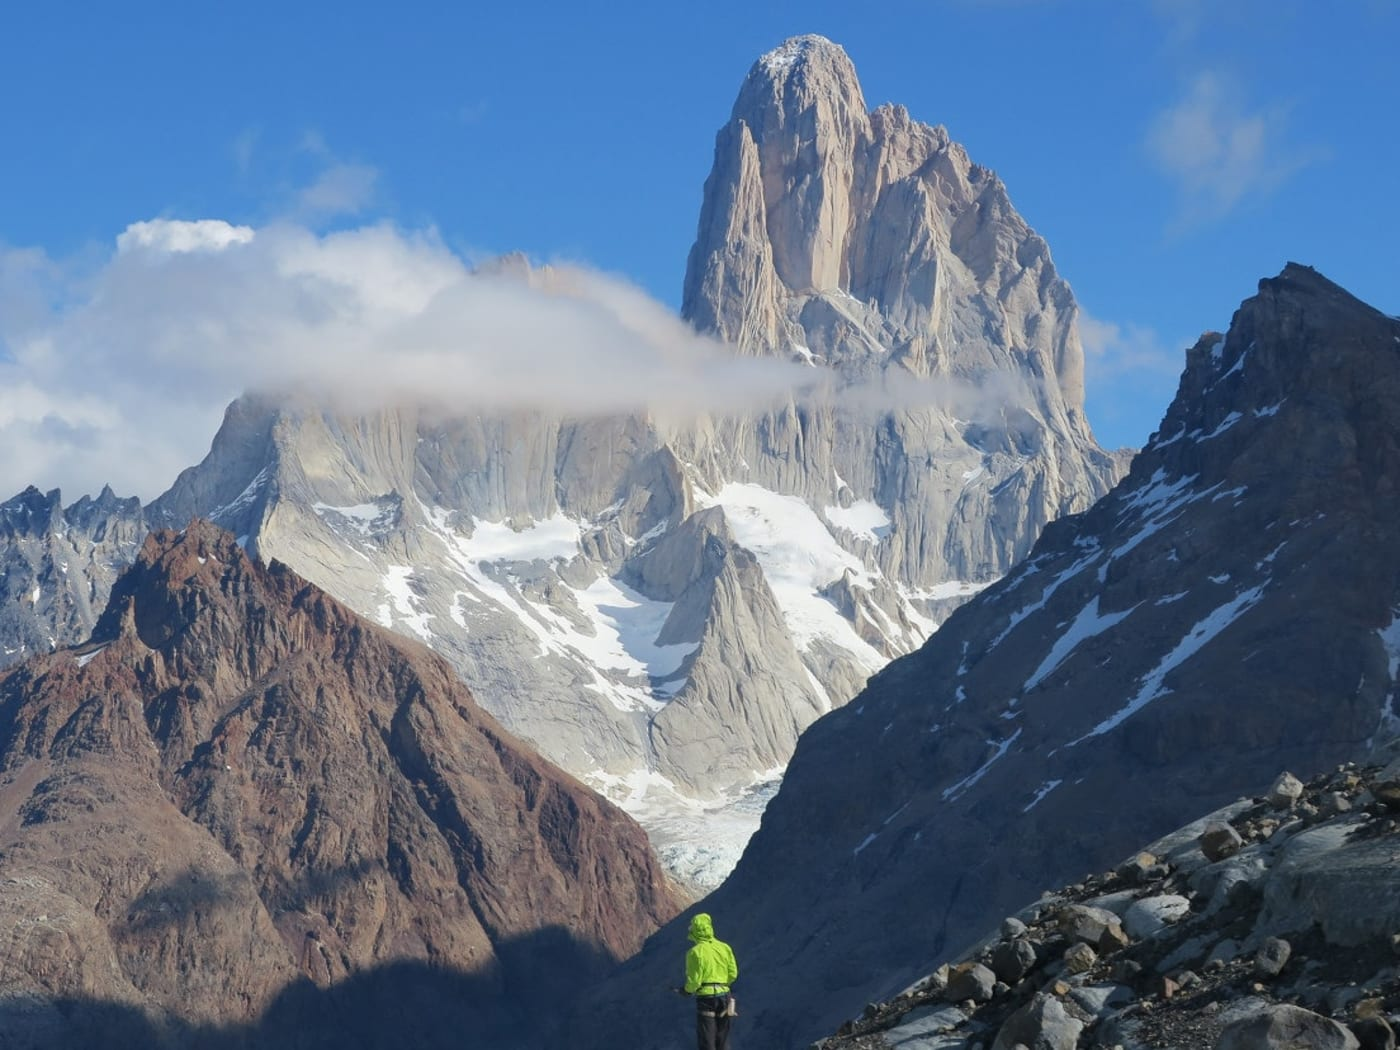 Trekking routes around the magnificent Mt Fitzroy